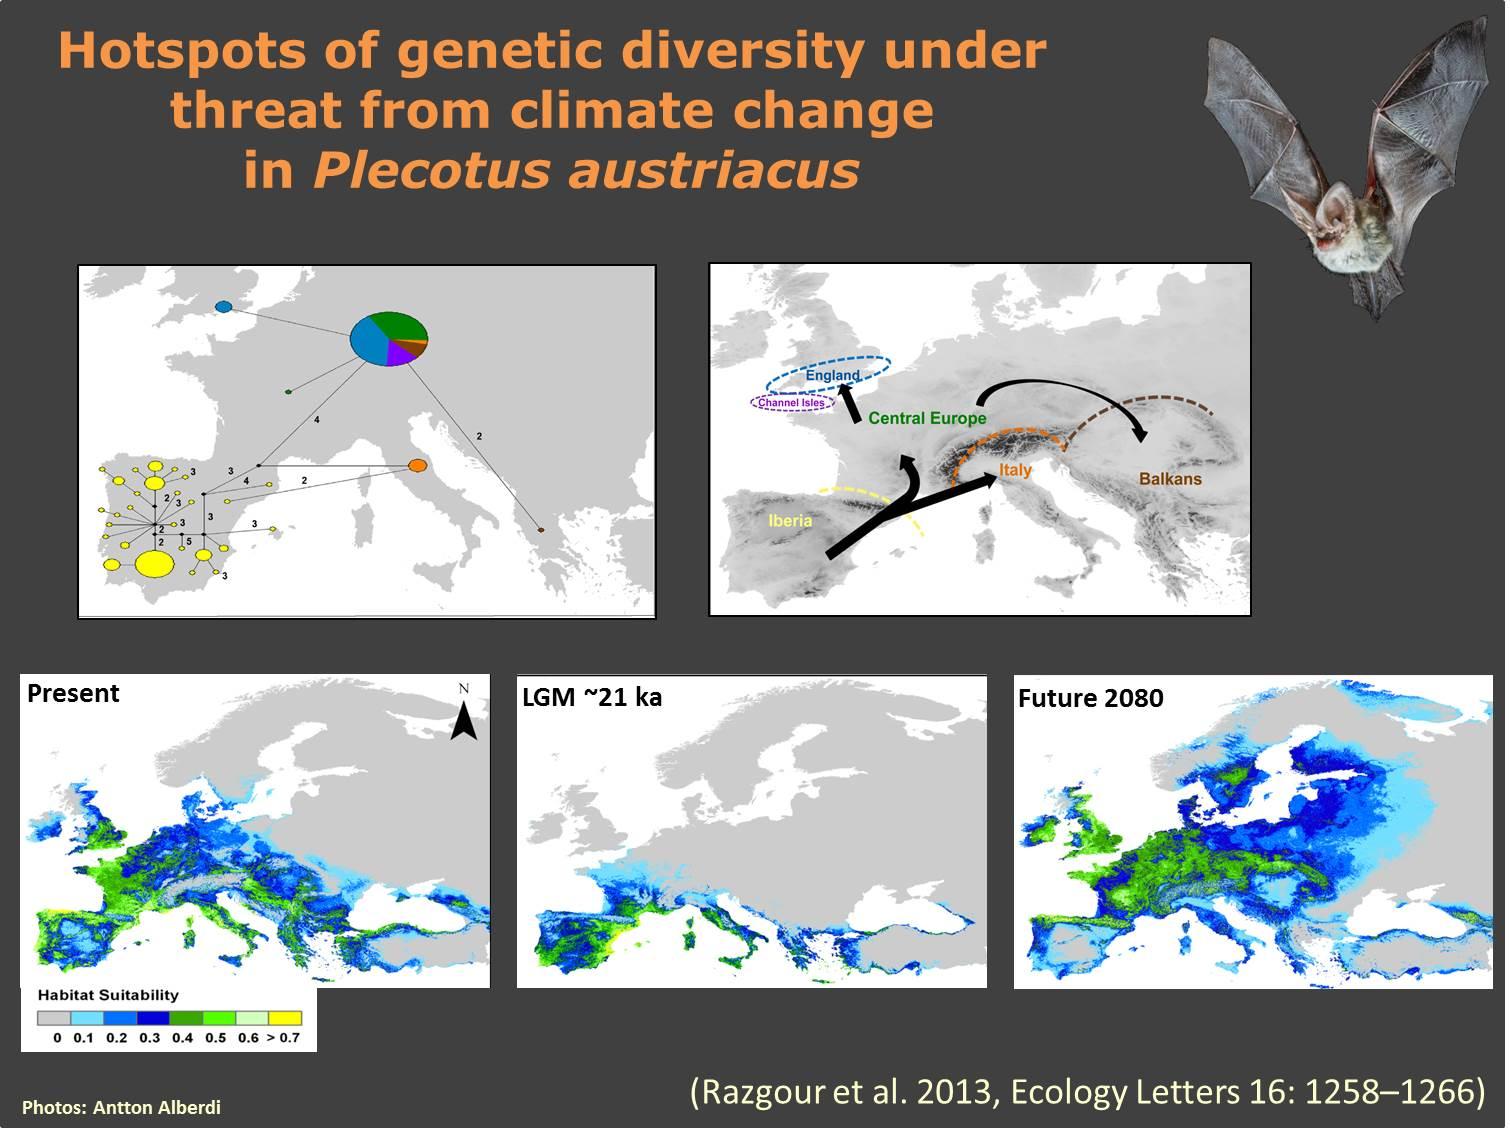 Razgour et al. 2013_Phylogegoraphy_Plecotus_austriacus